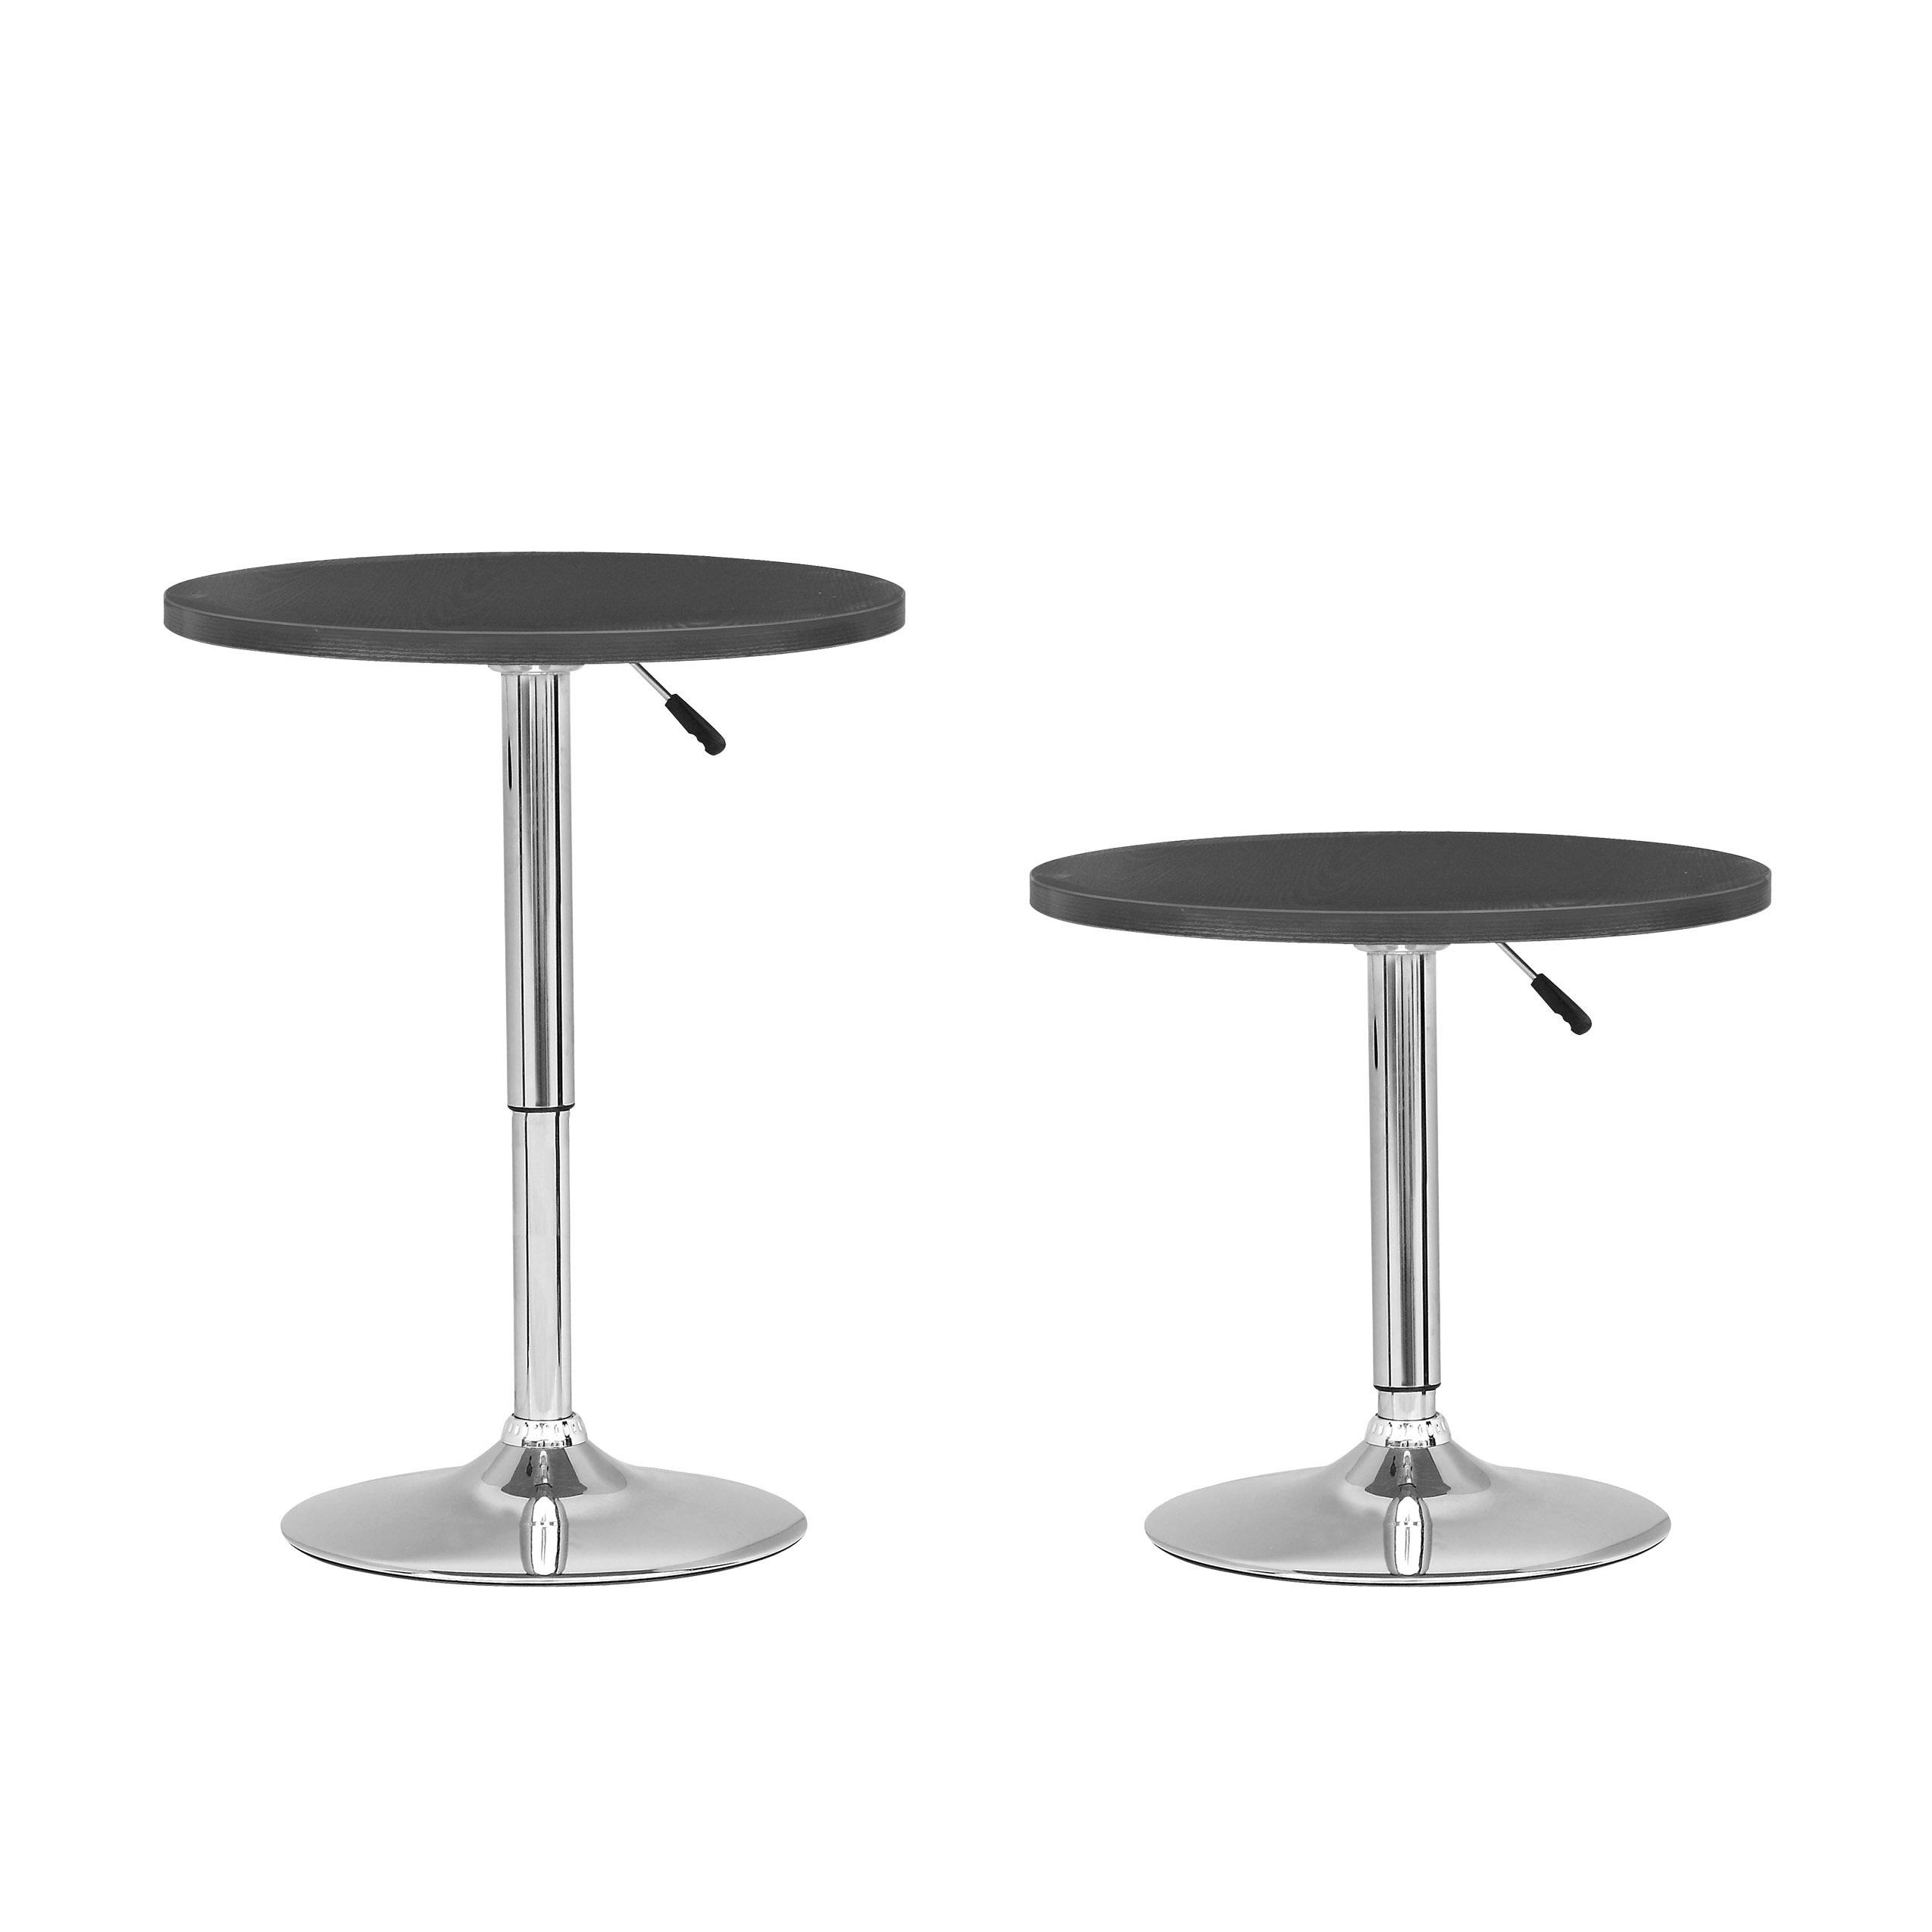 Shop corliving adjustable height round bar table free shipping shop corliving adjustable height round bar table free shipping today overstock 9168126 watchthetrailerfo